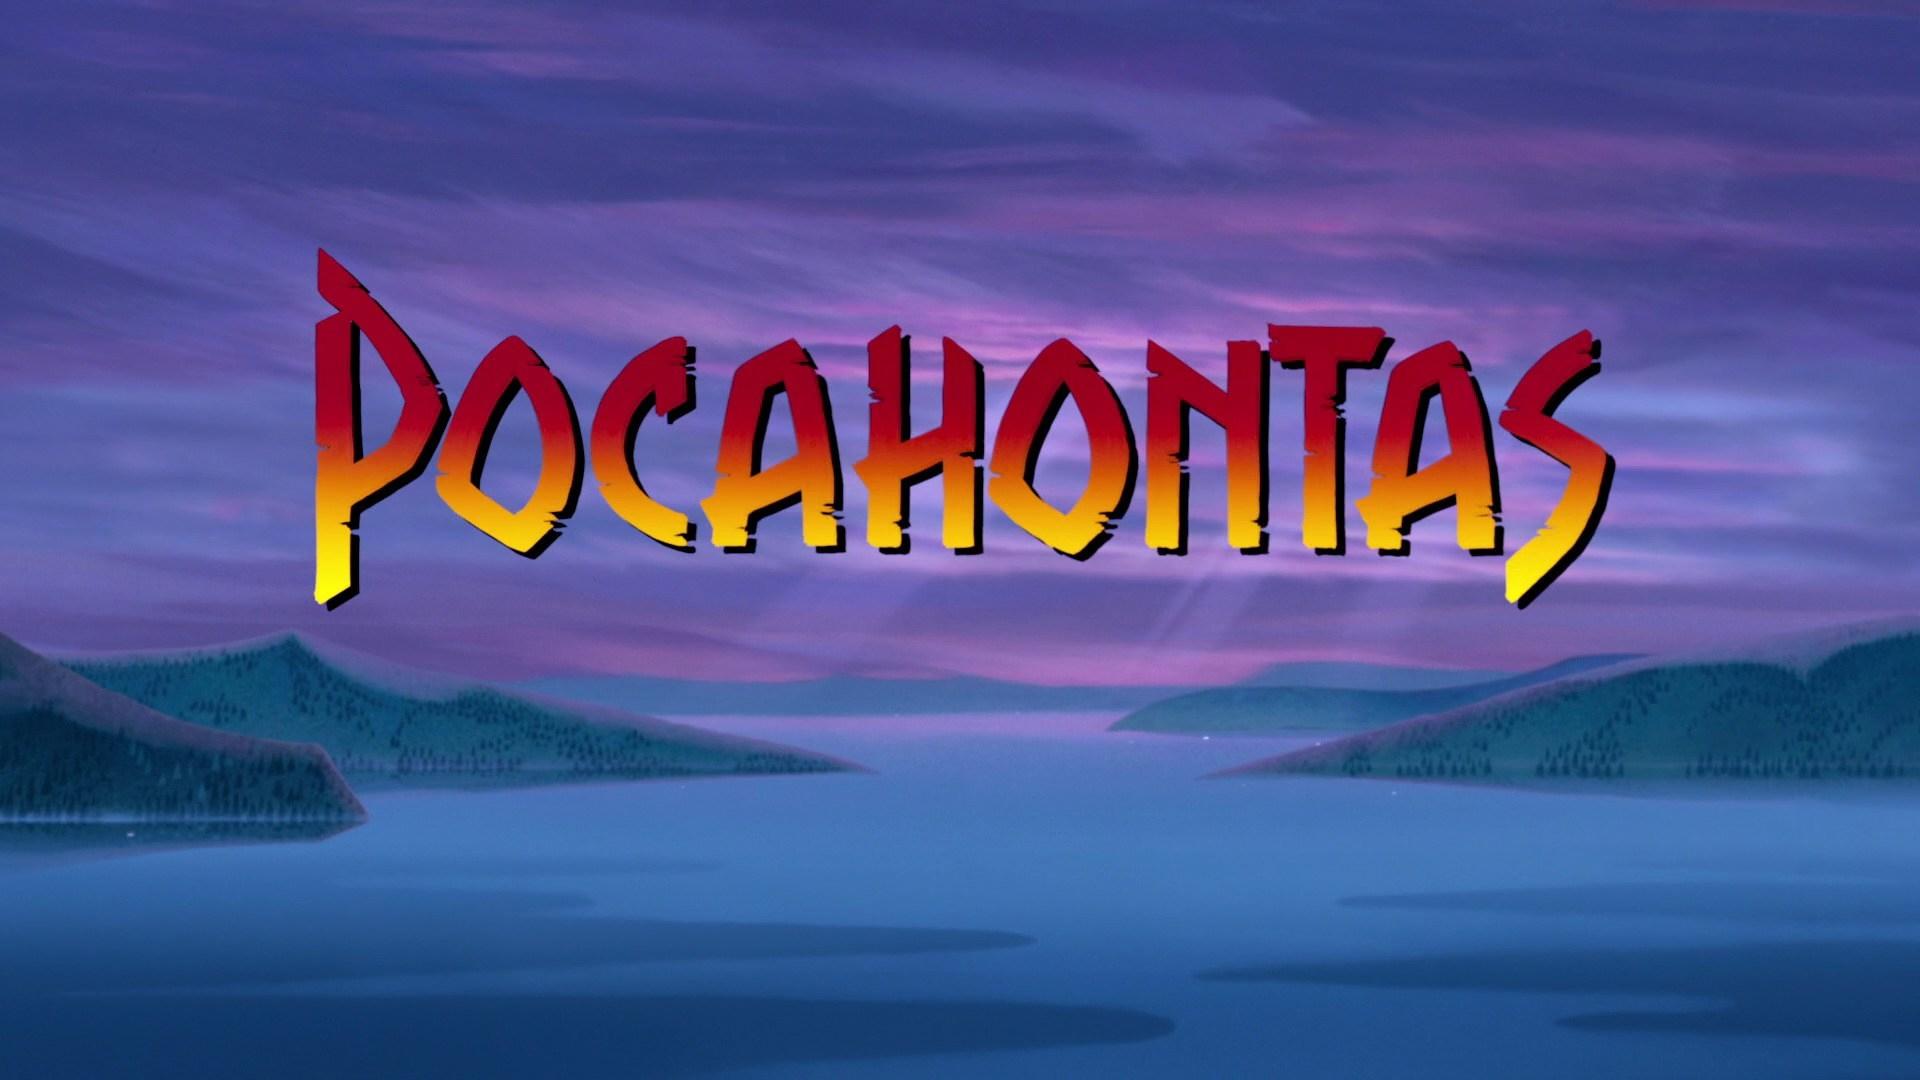 Pocahontas (Disneys Sweden) (@robertopippi) Cover Image